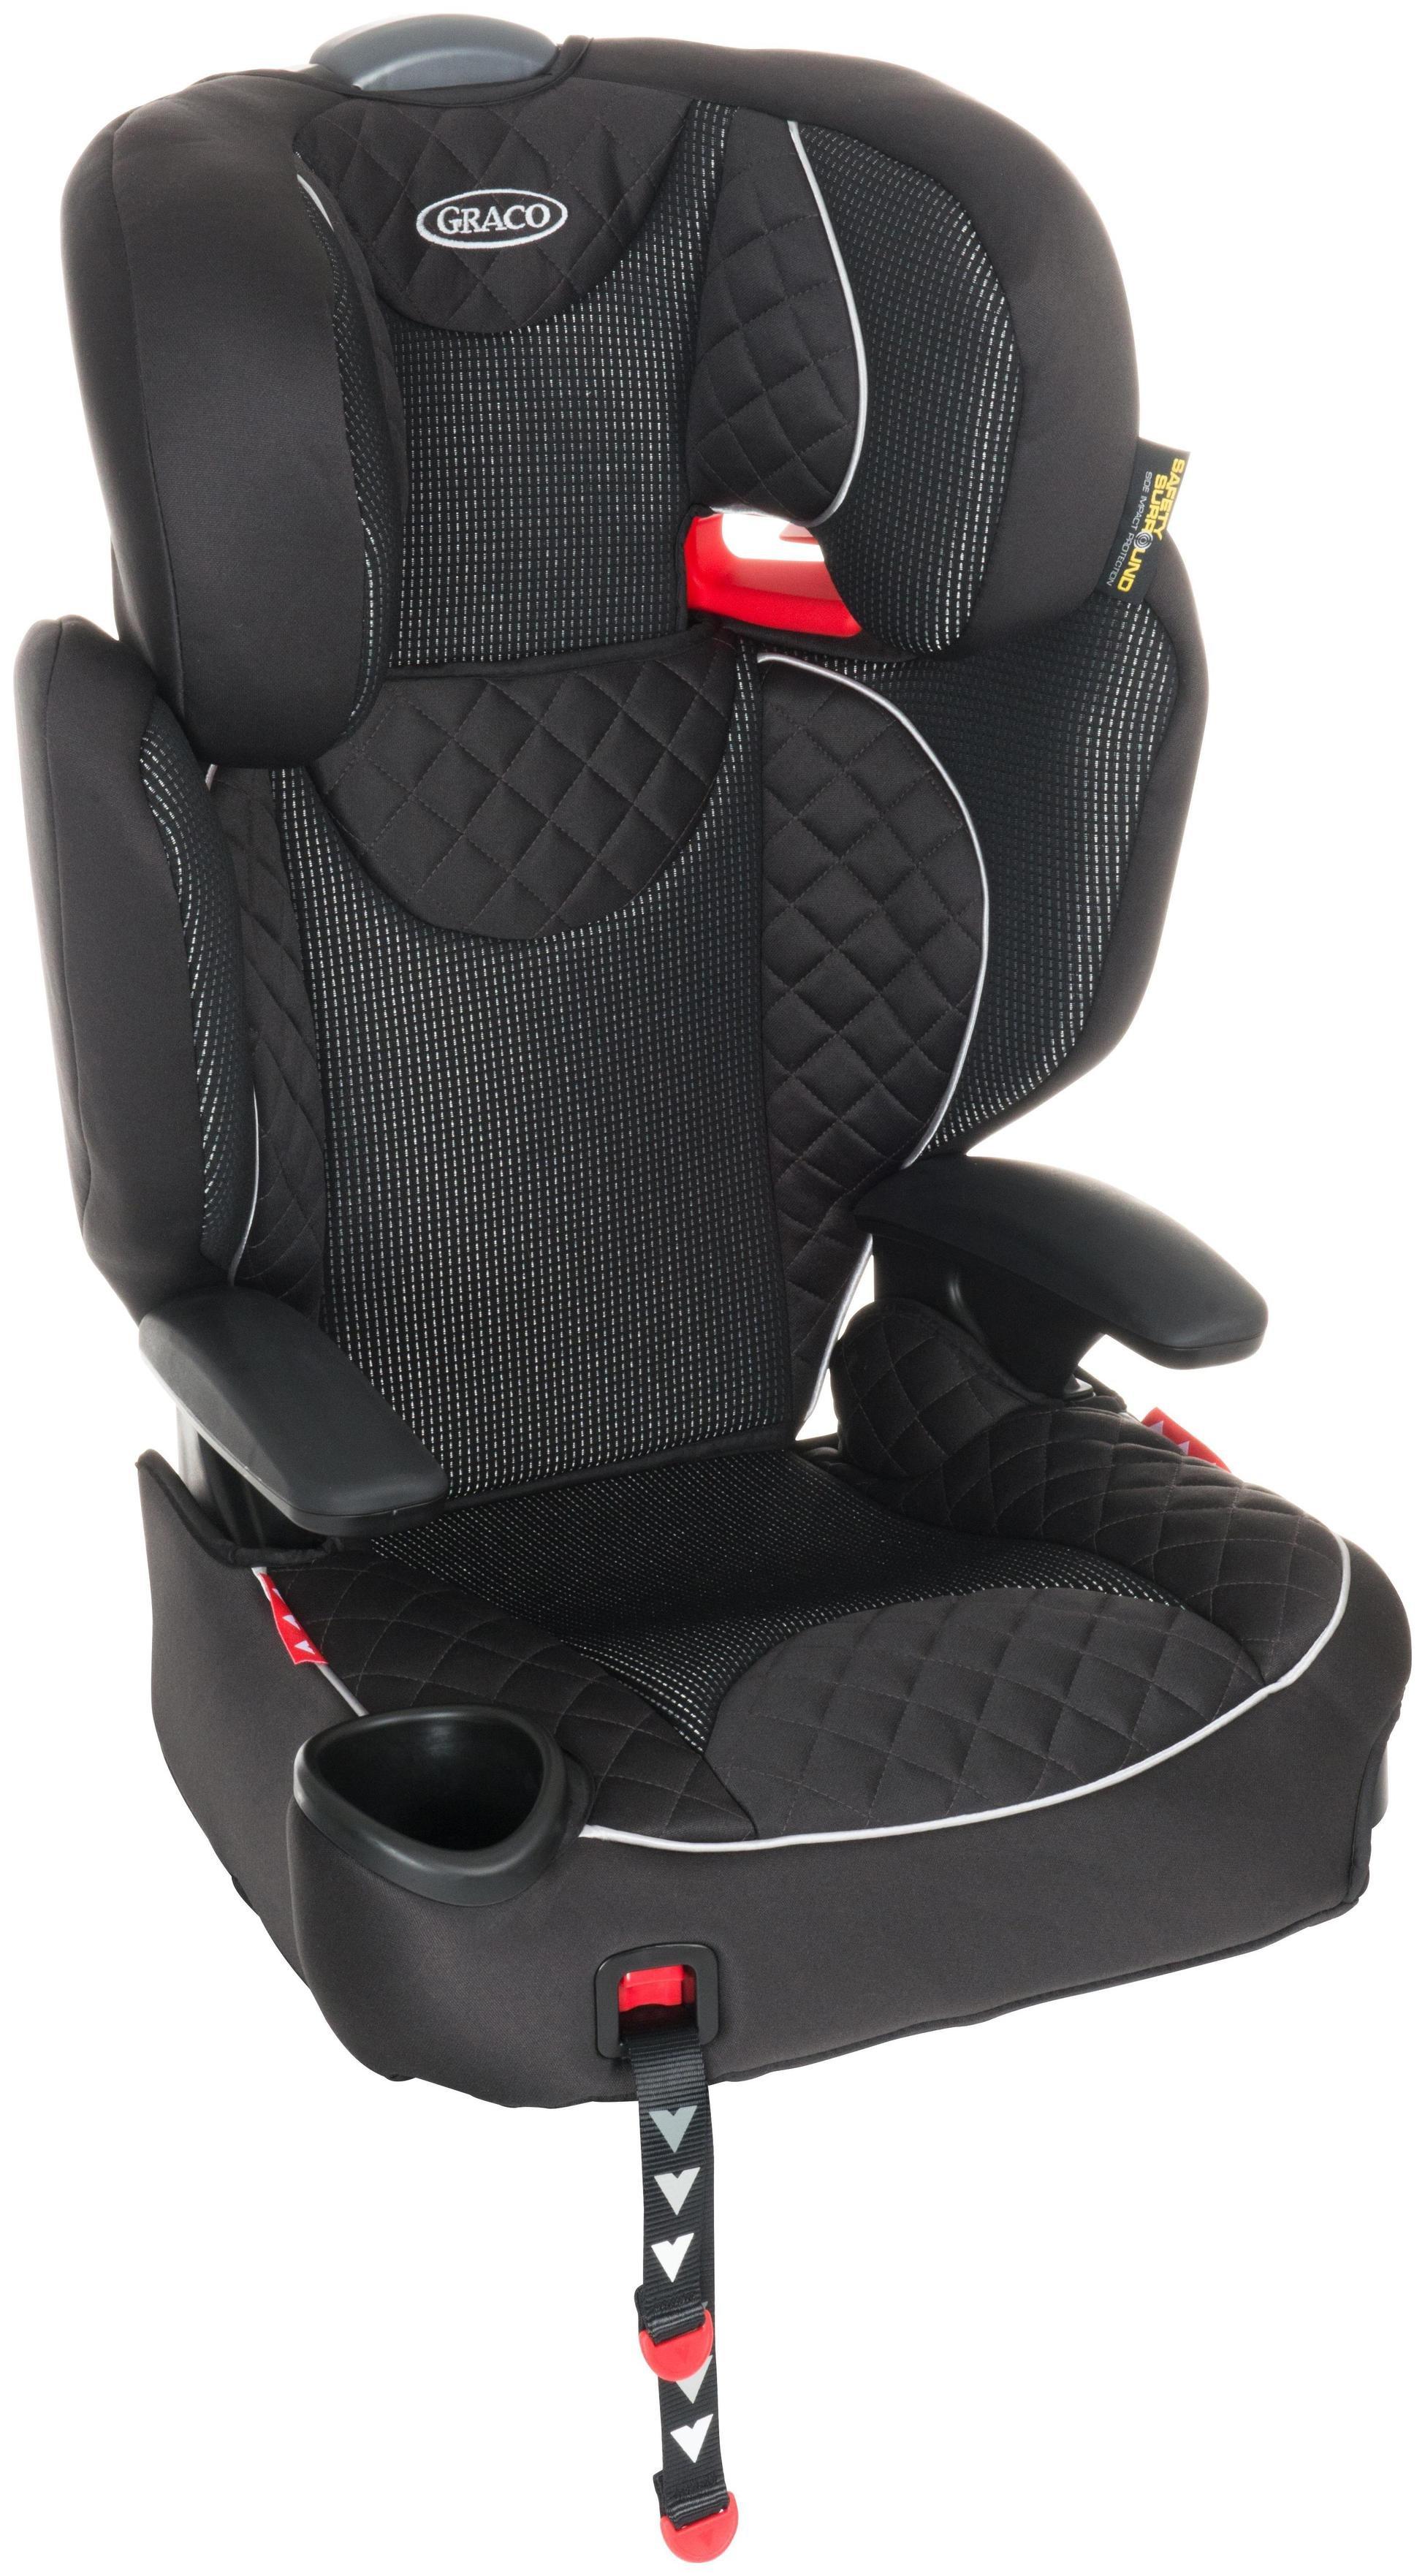 Image of Graco Affix Car Seat - Stargazer.